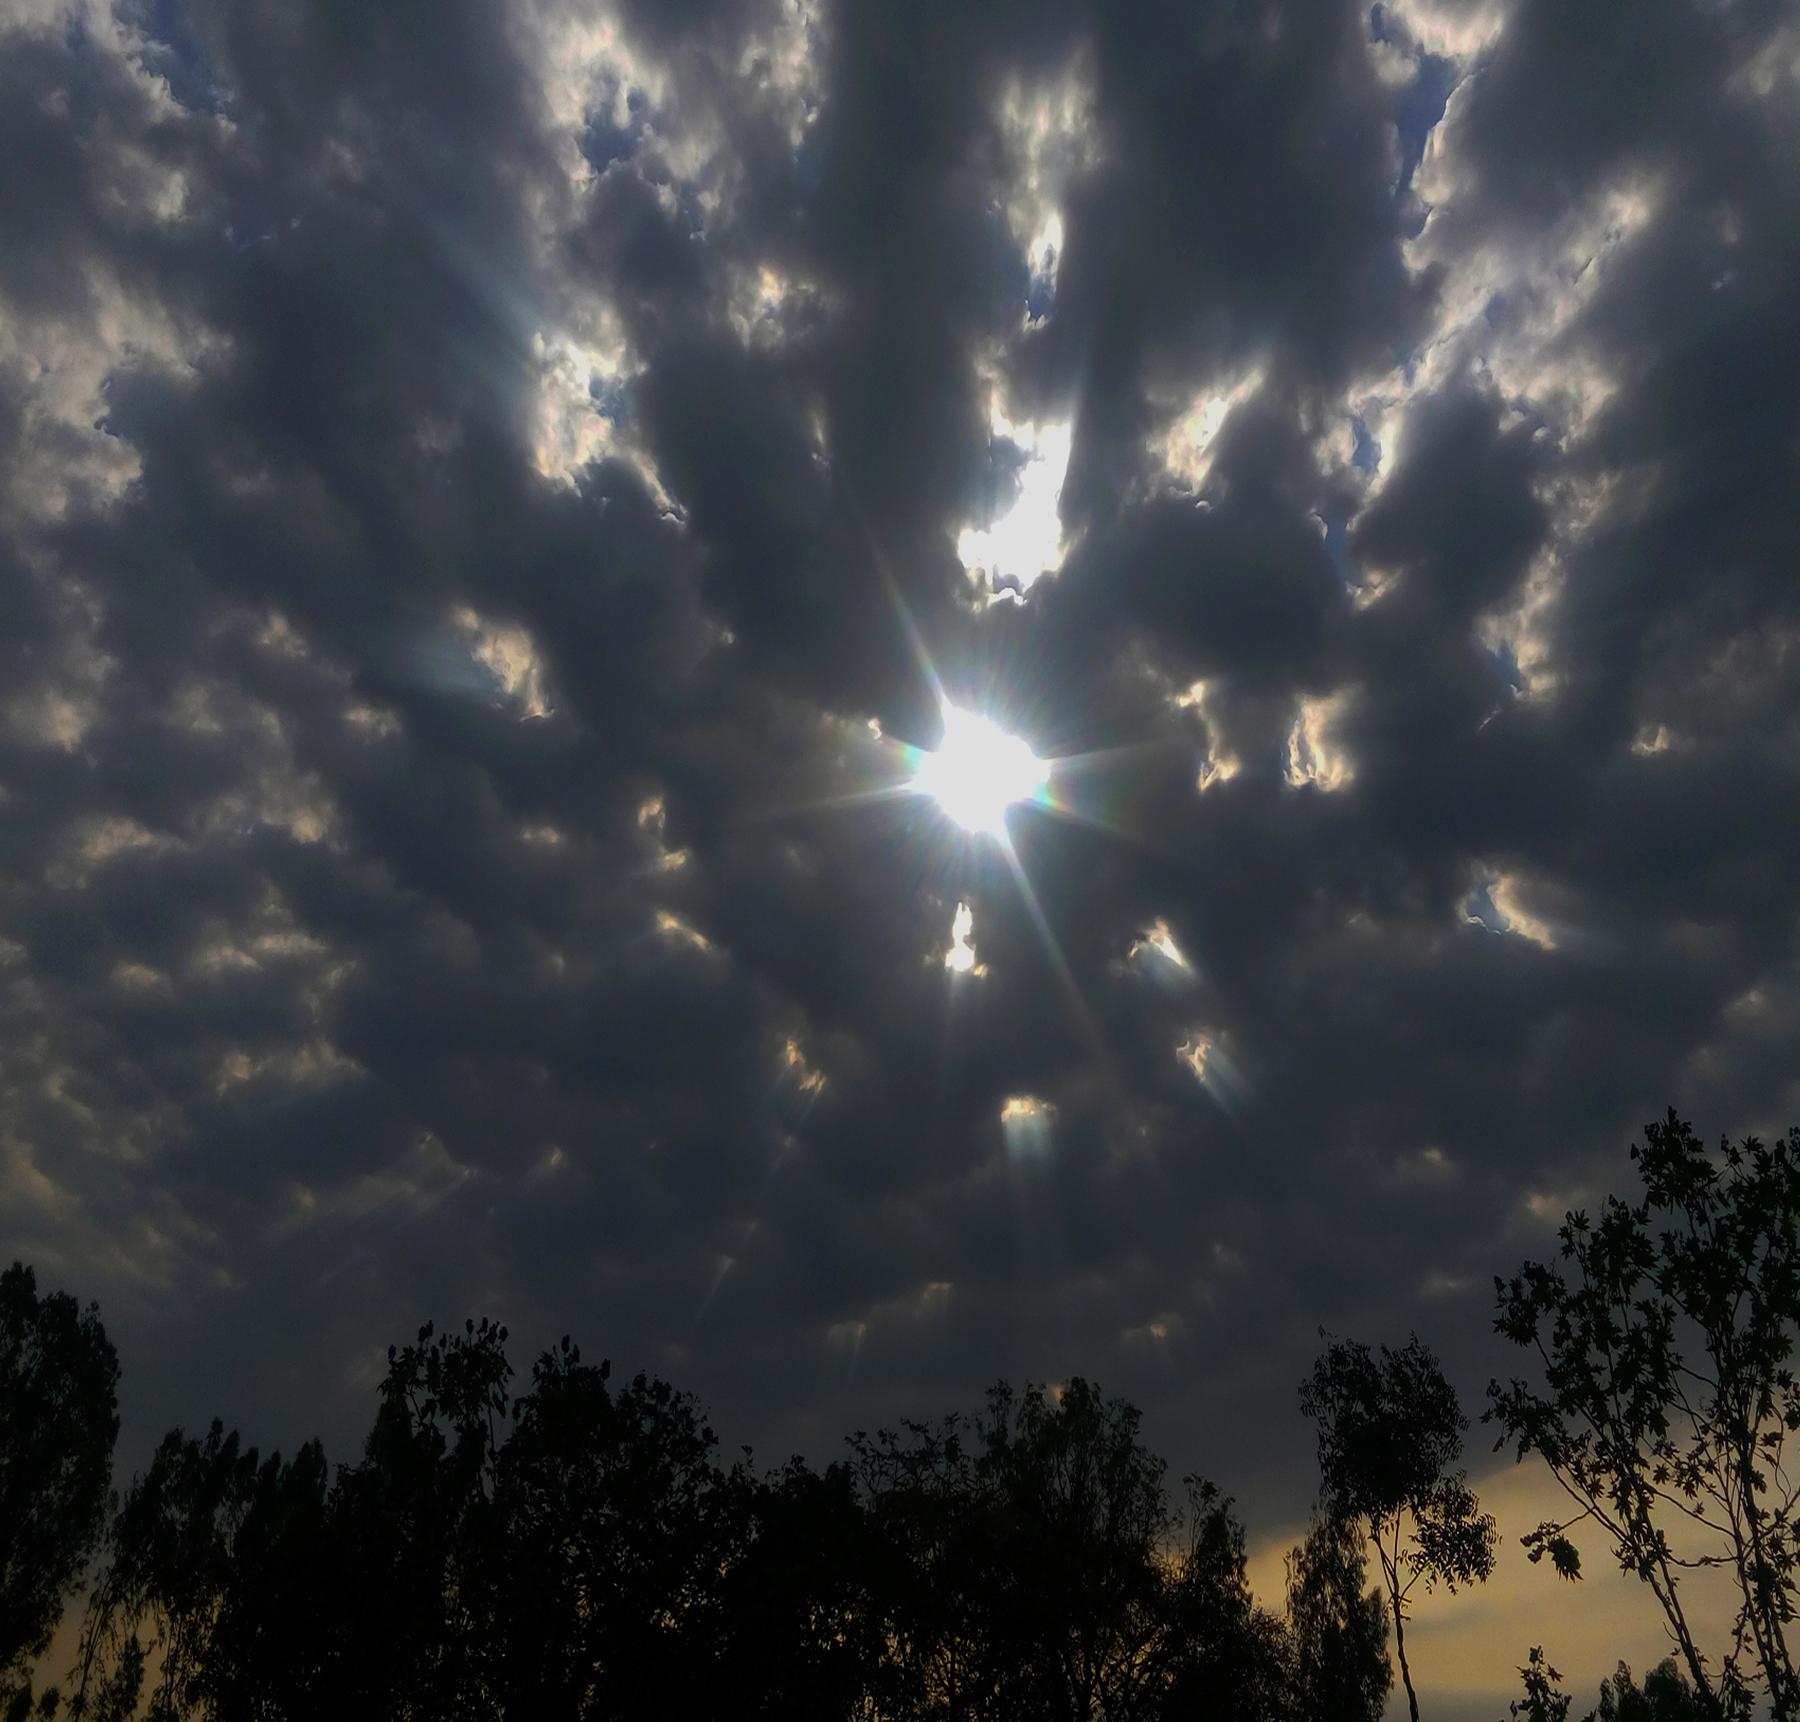 A glimpse of ray flicker through dark sky.